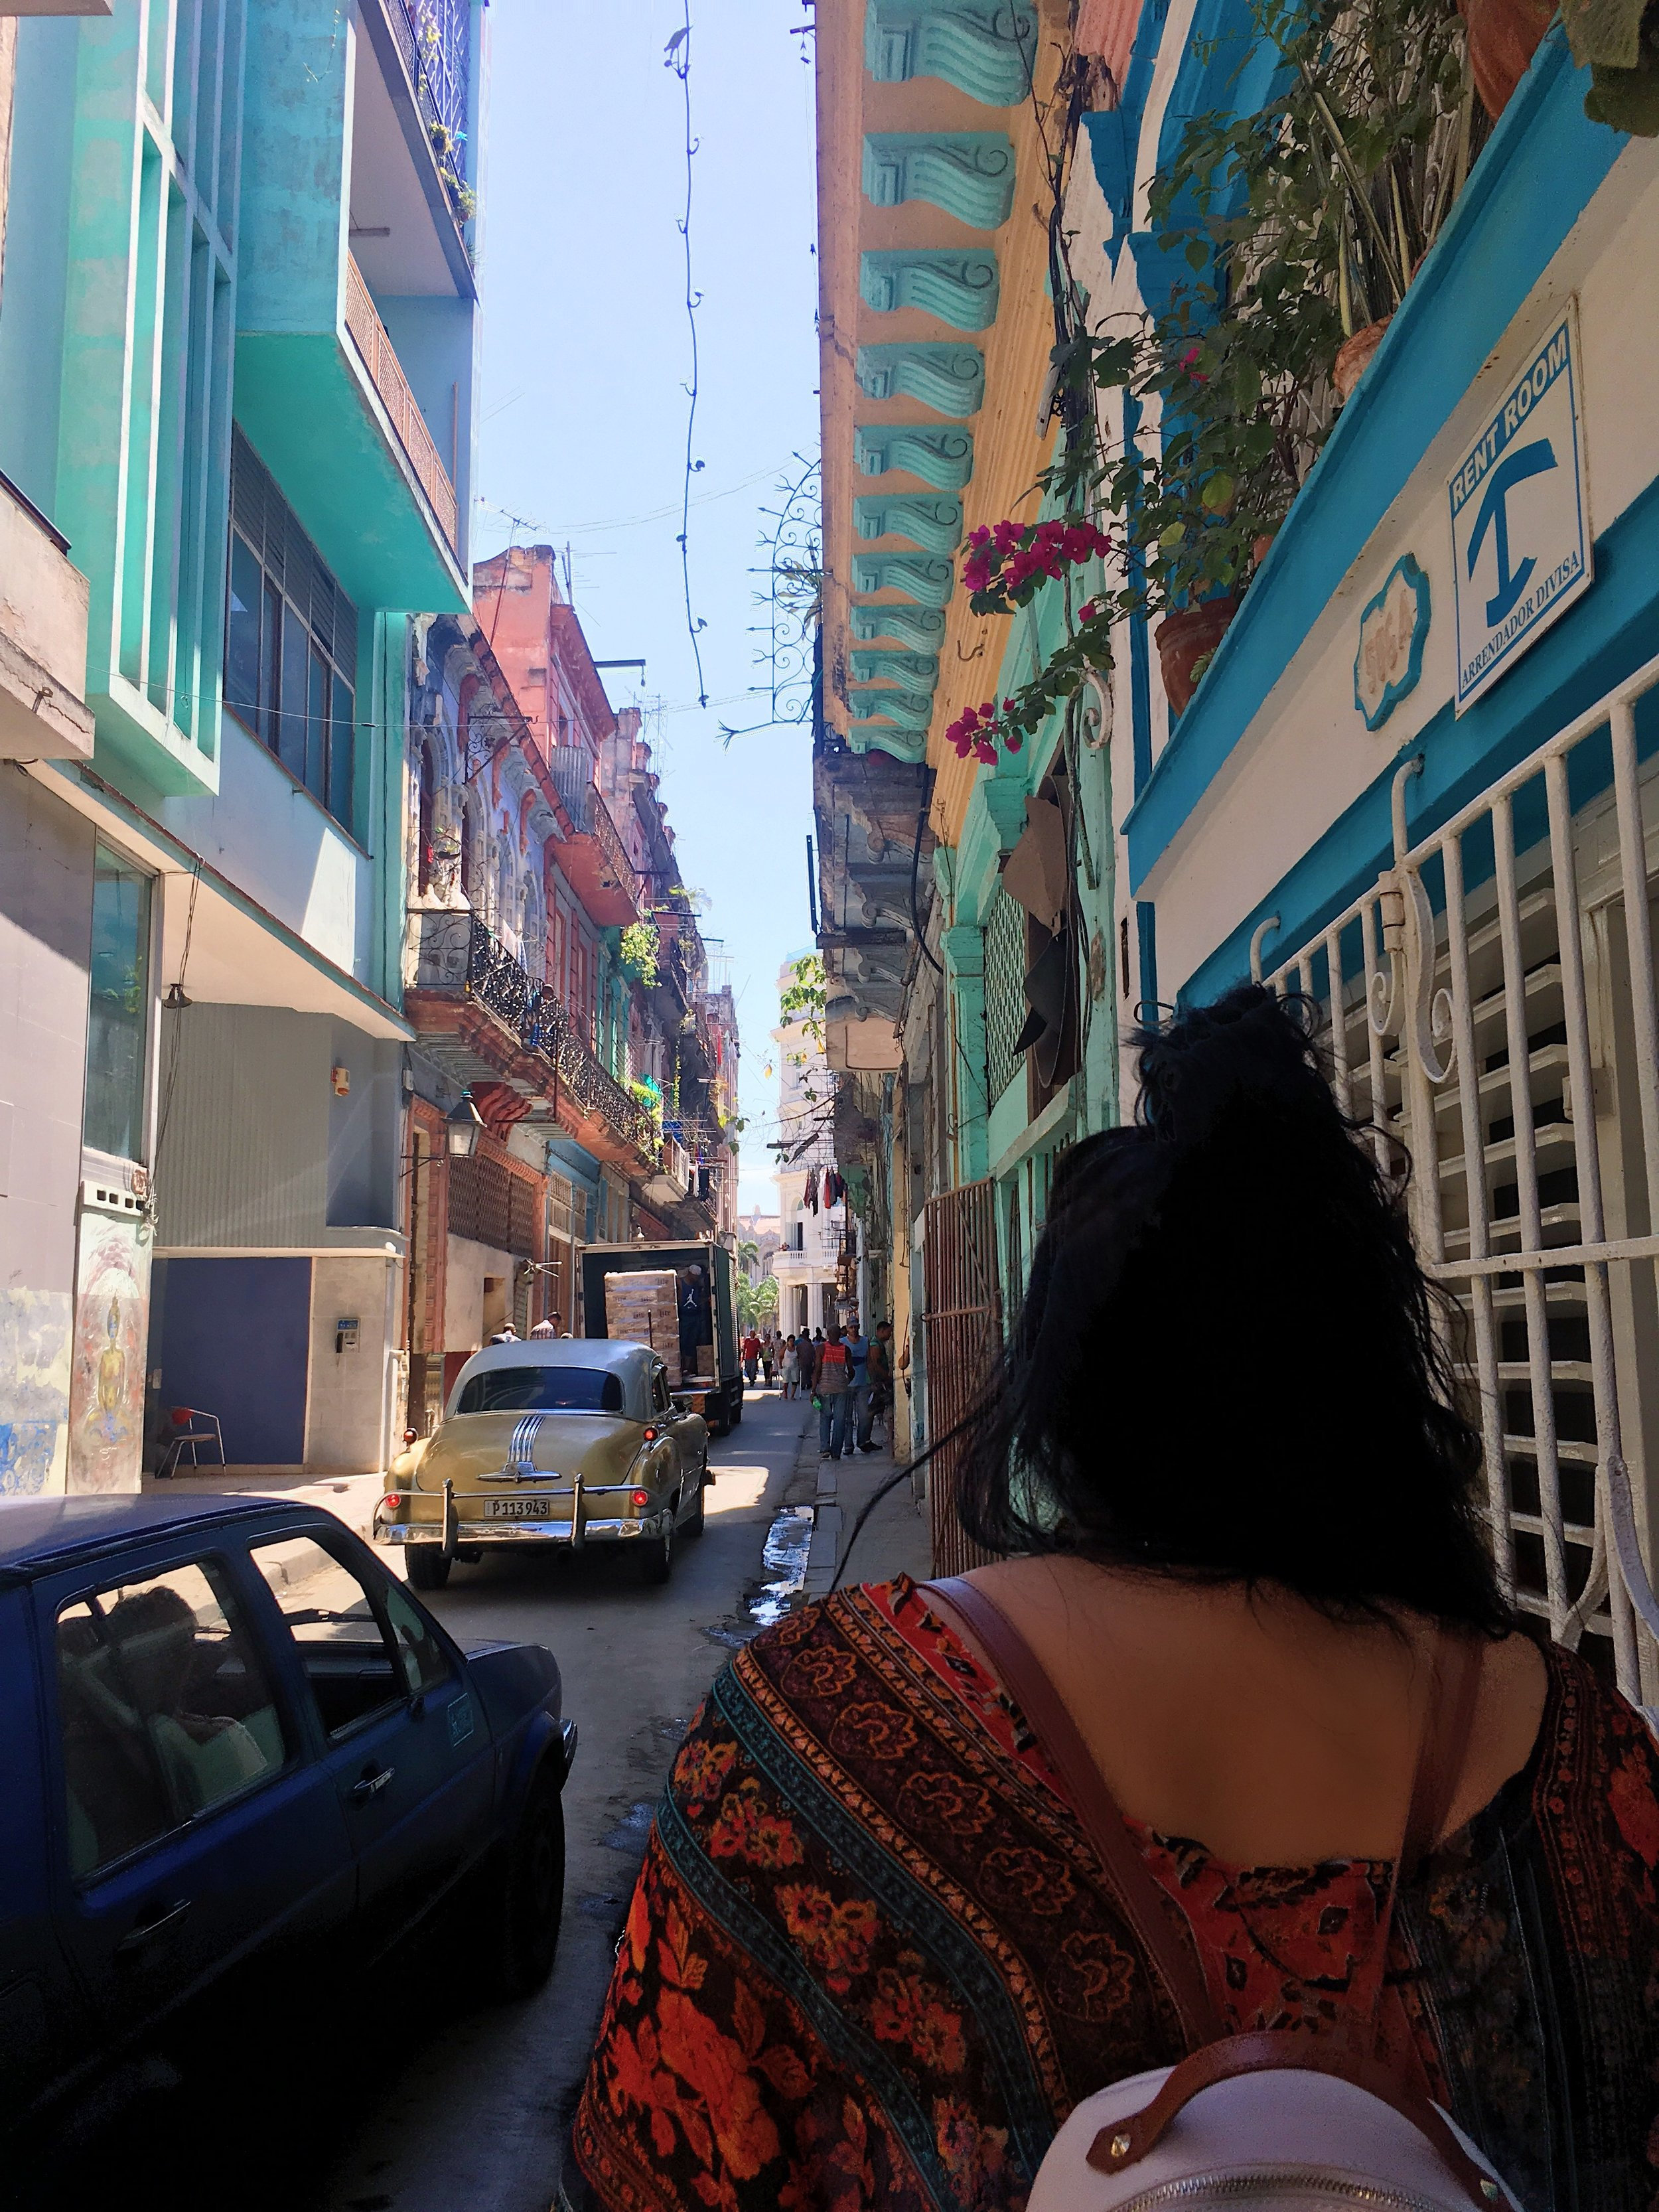 Wandering the streets of Old Havana